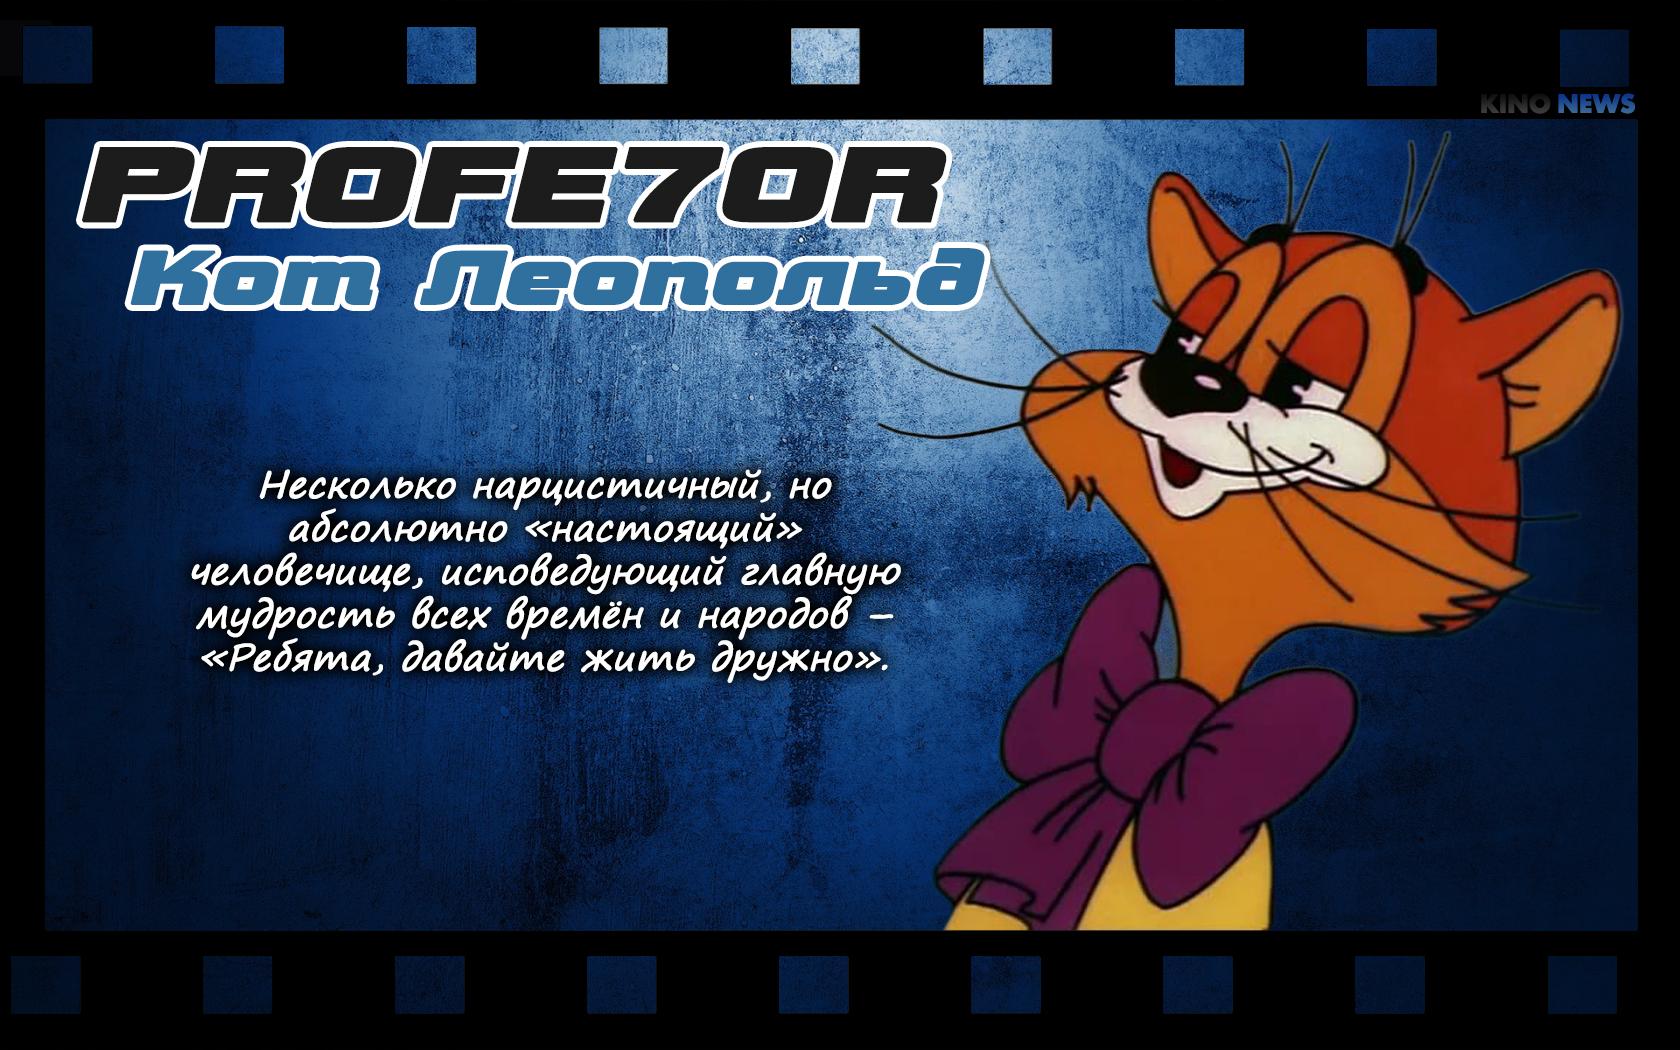 https://www.kinonews.ru/insimgs/2017/persimg/persimg77944_52.jpg